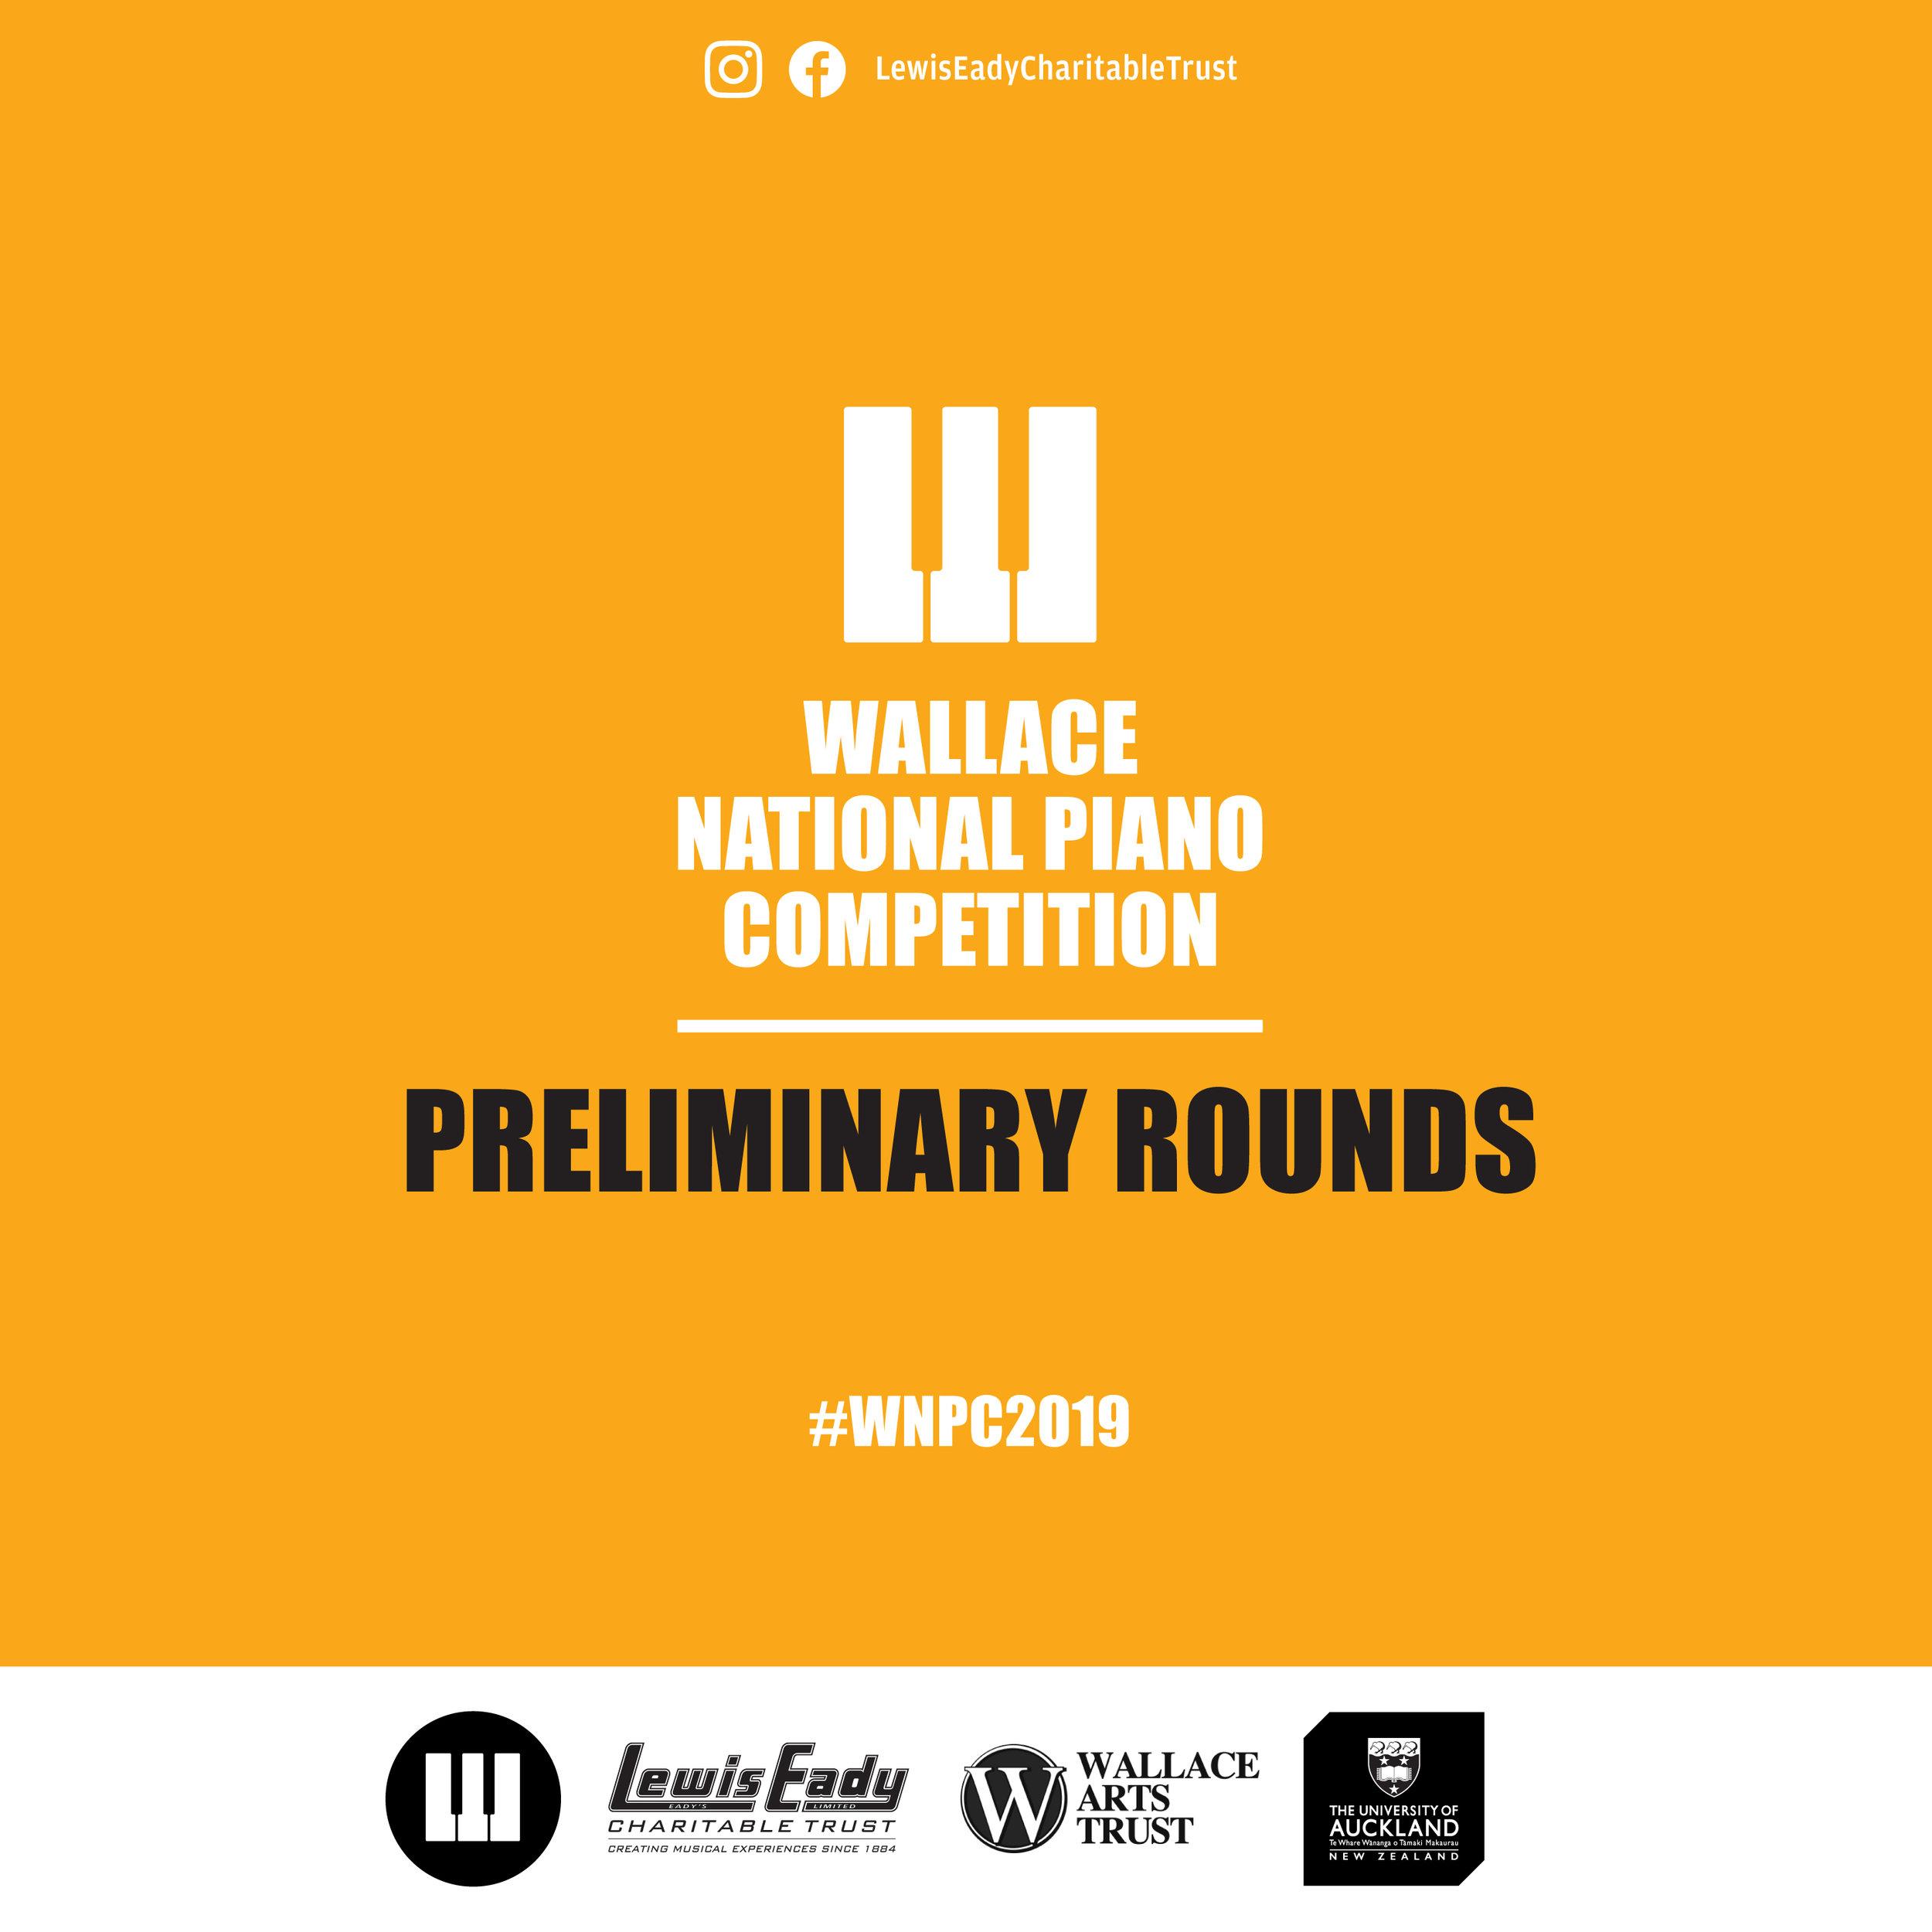 WNPC_2019_Insta_Prelim_Rounds.jpg